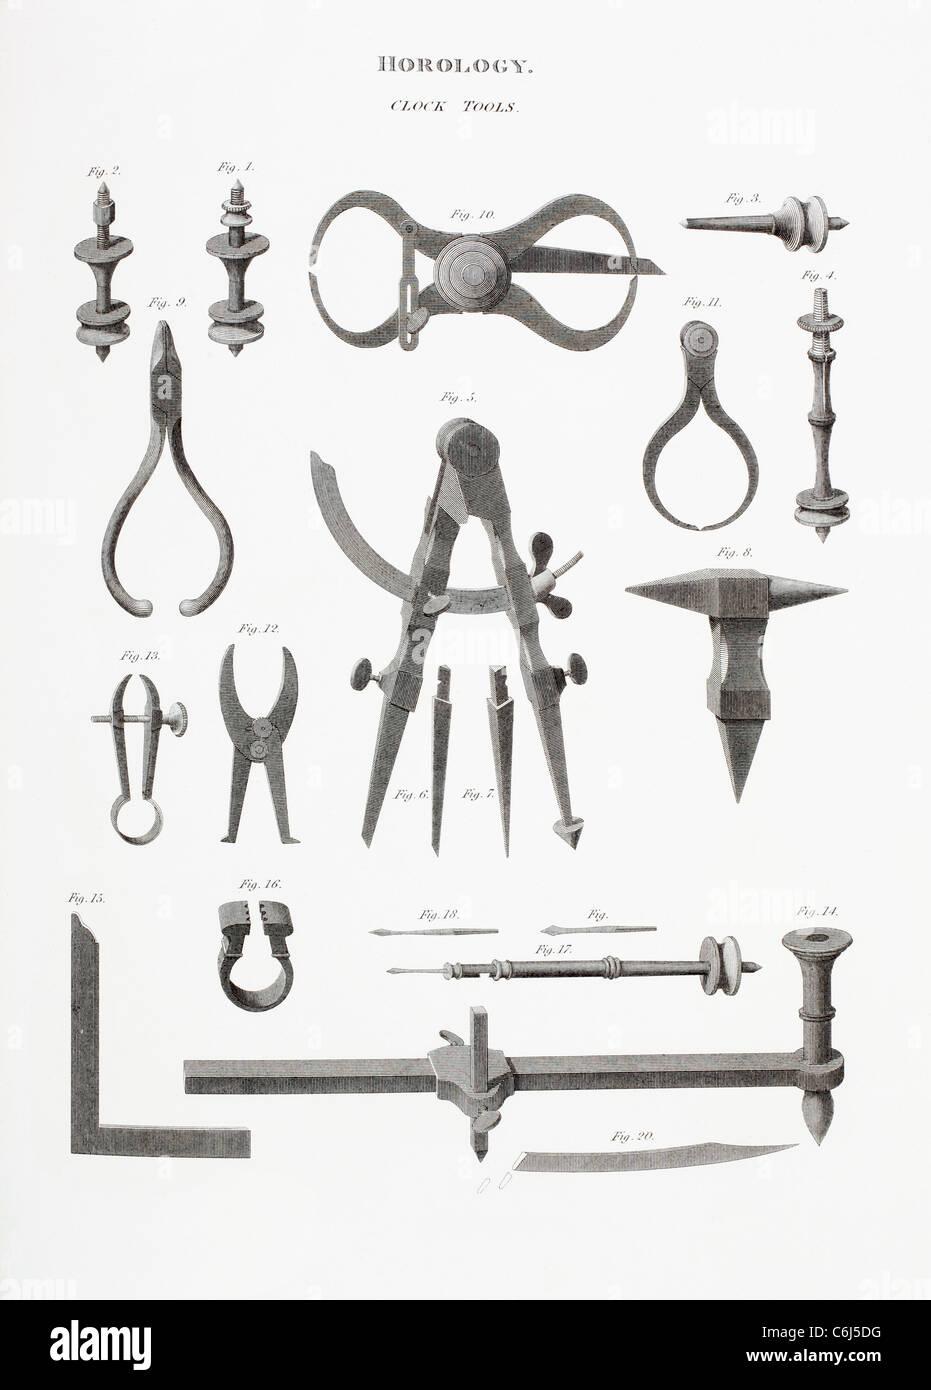 19th Century Tools Stock Photos & 19th Century Tools Stock